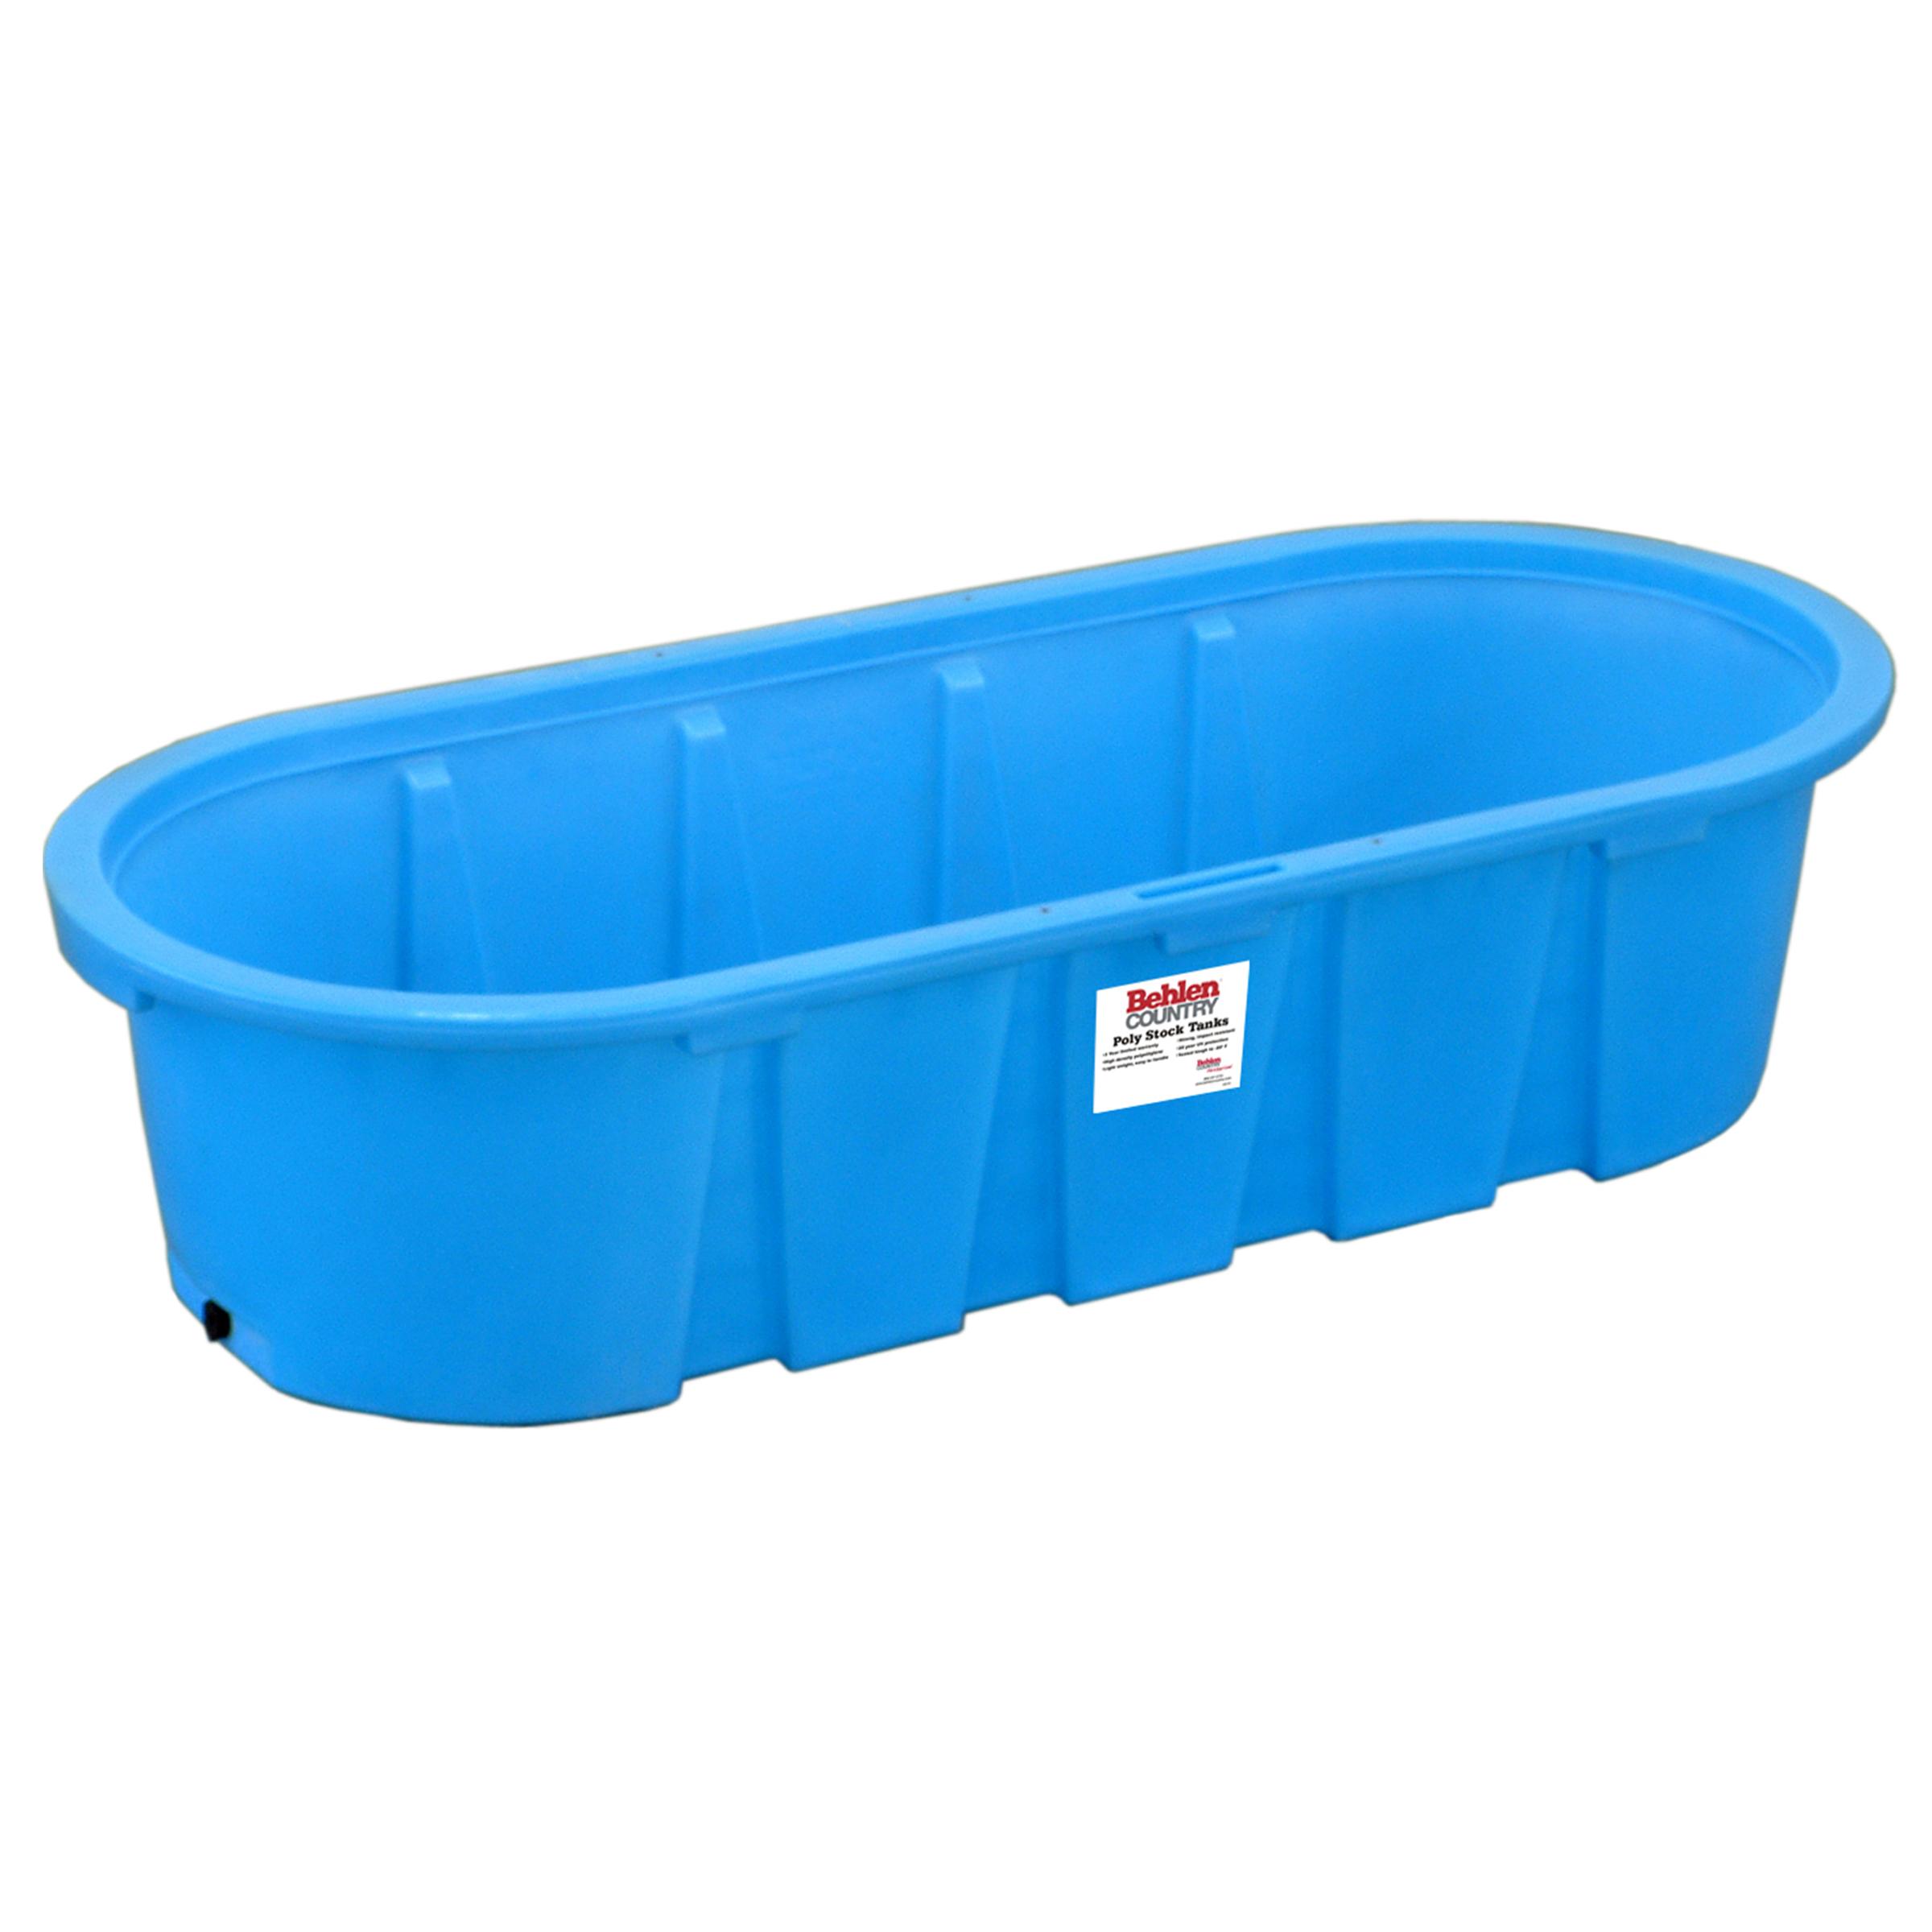 Behlen 3 X 2 X 8 Blue Poly Tank 52112187 919744